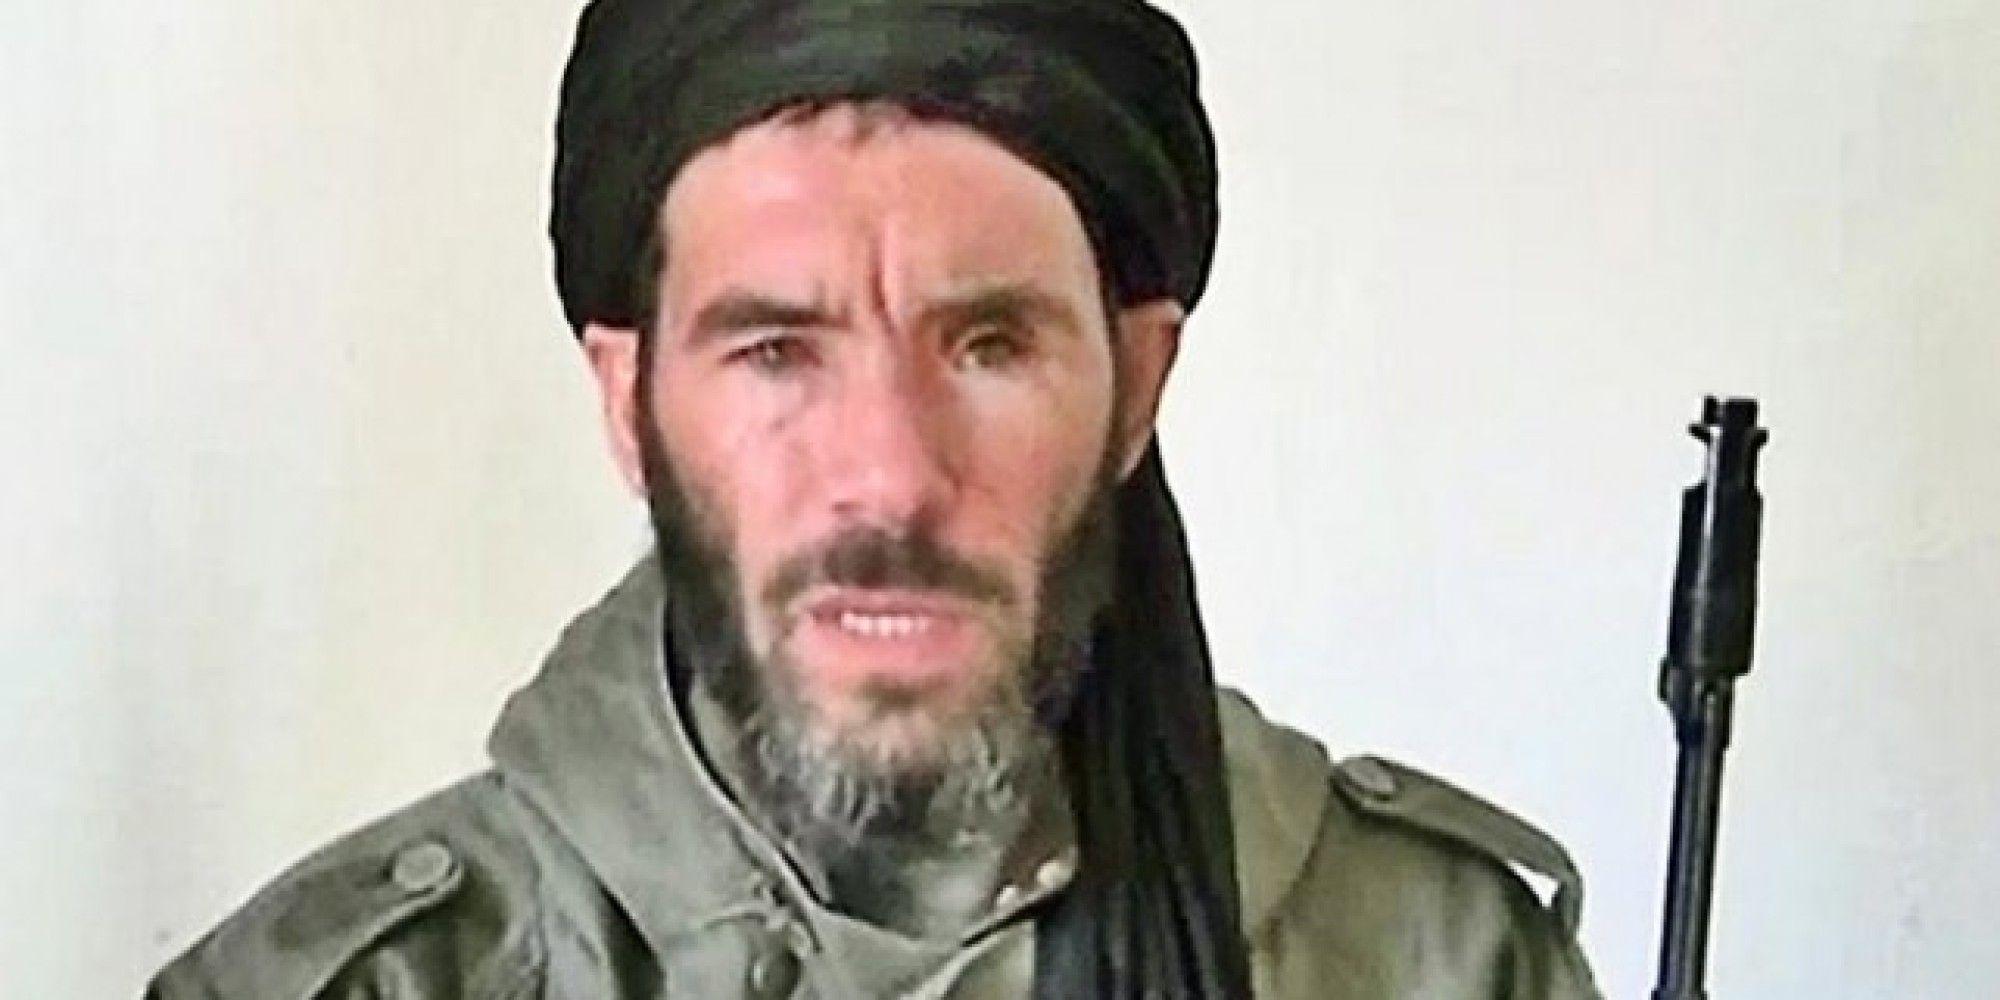 Mokhtar Belmokhtar